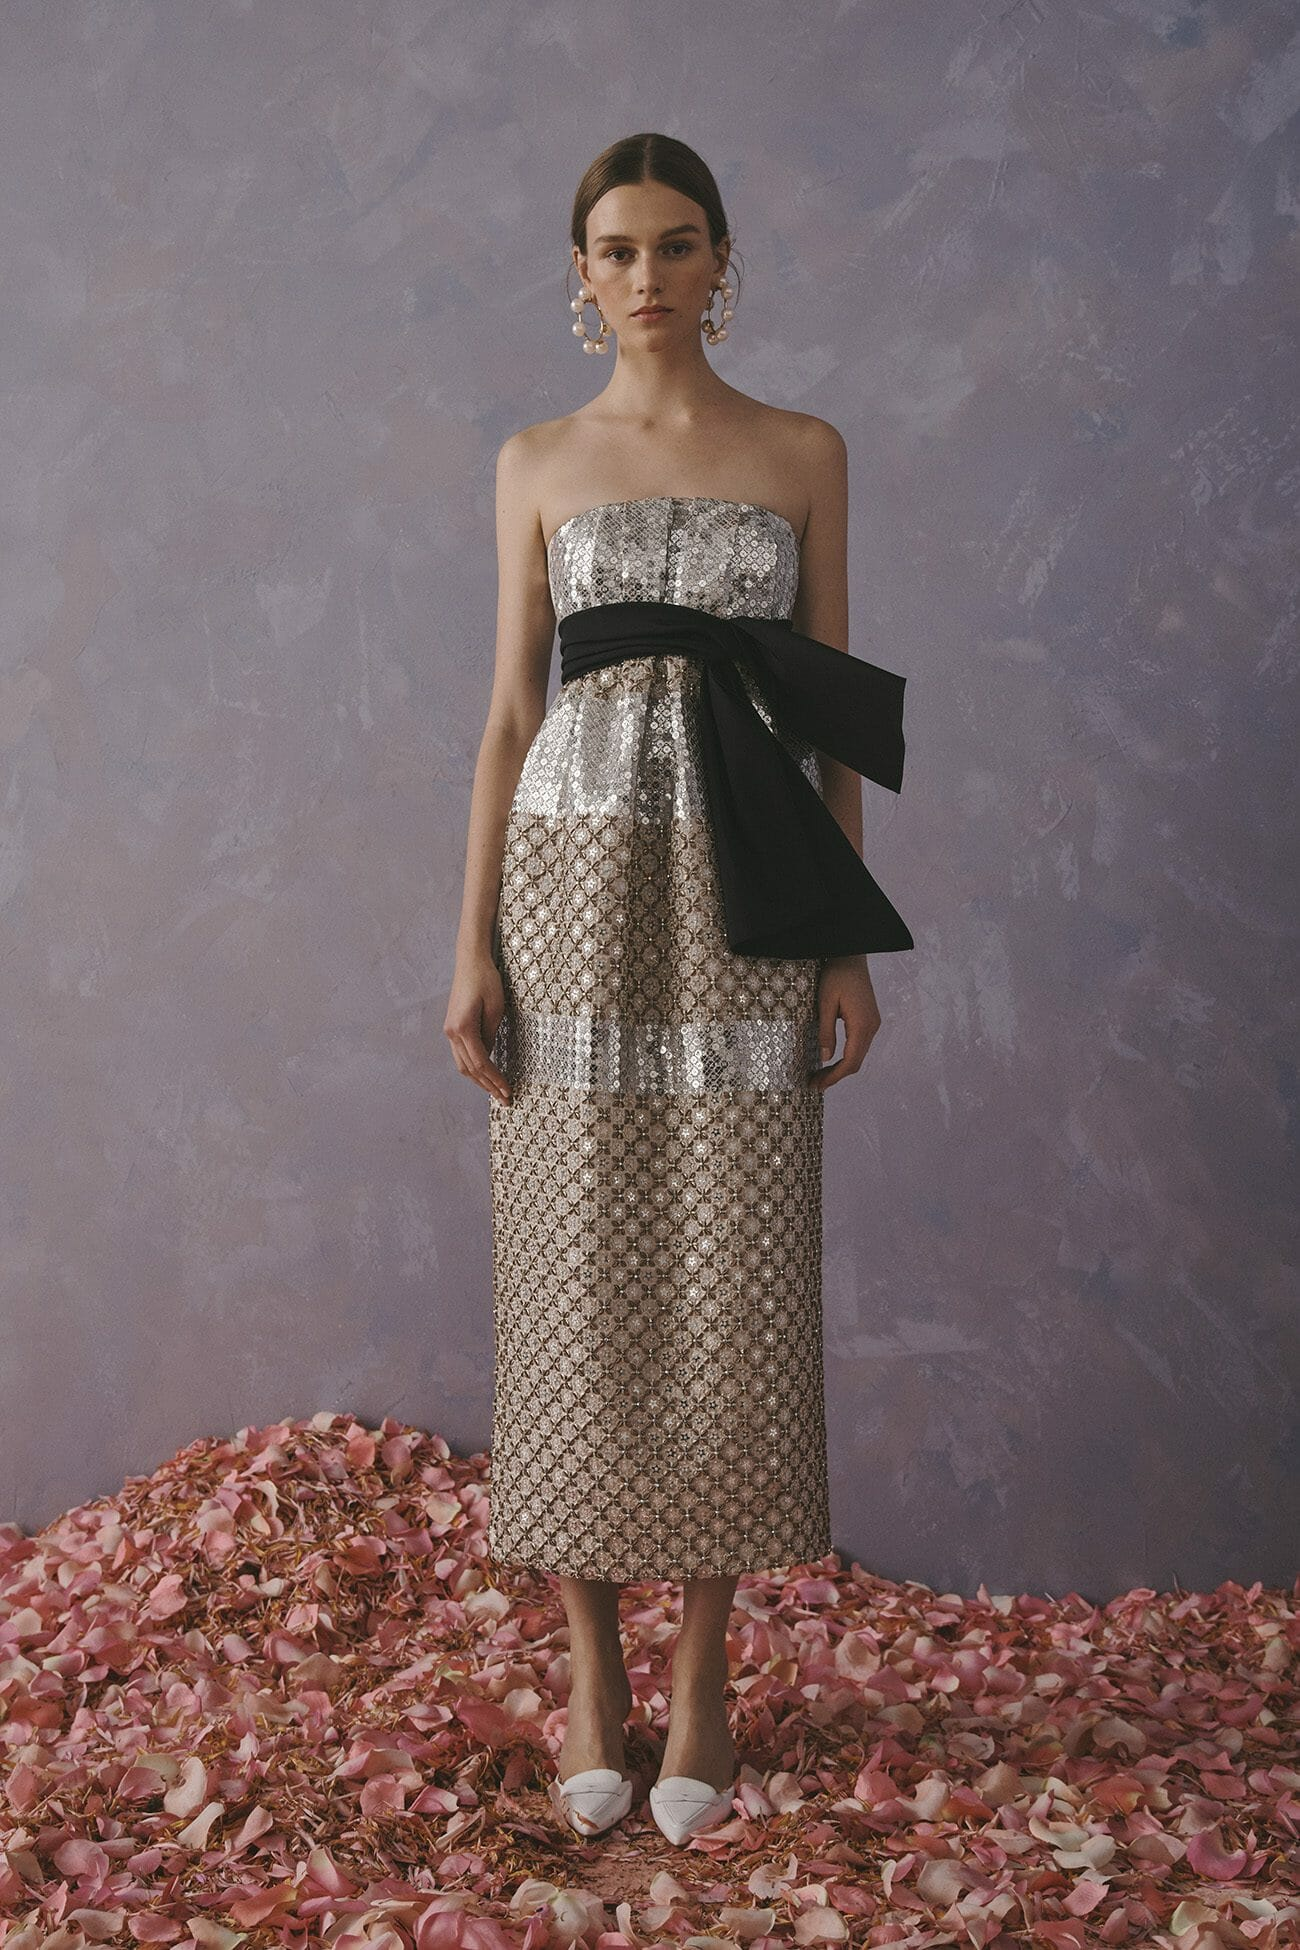 Carolina Herrera New York Resort 2020 Collection crochet glitter long strapless neckline dress